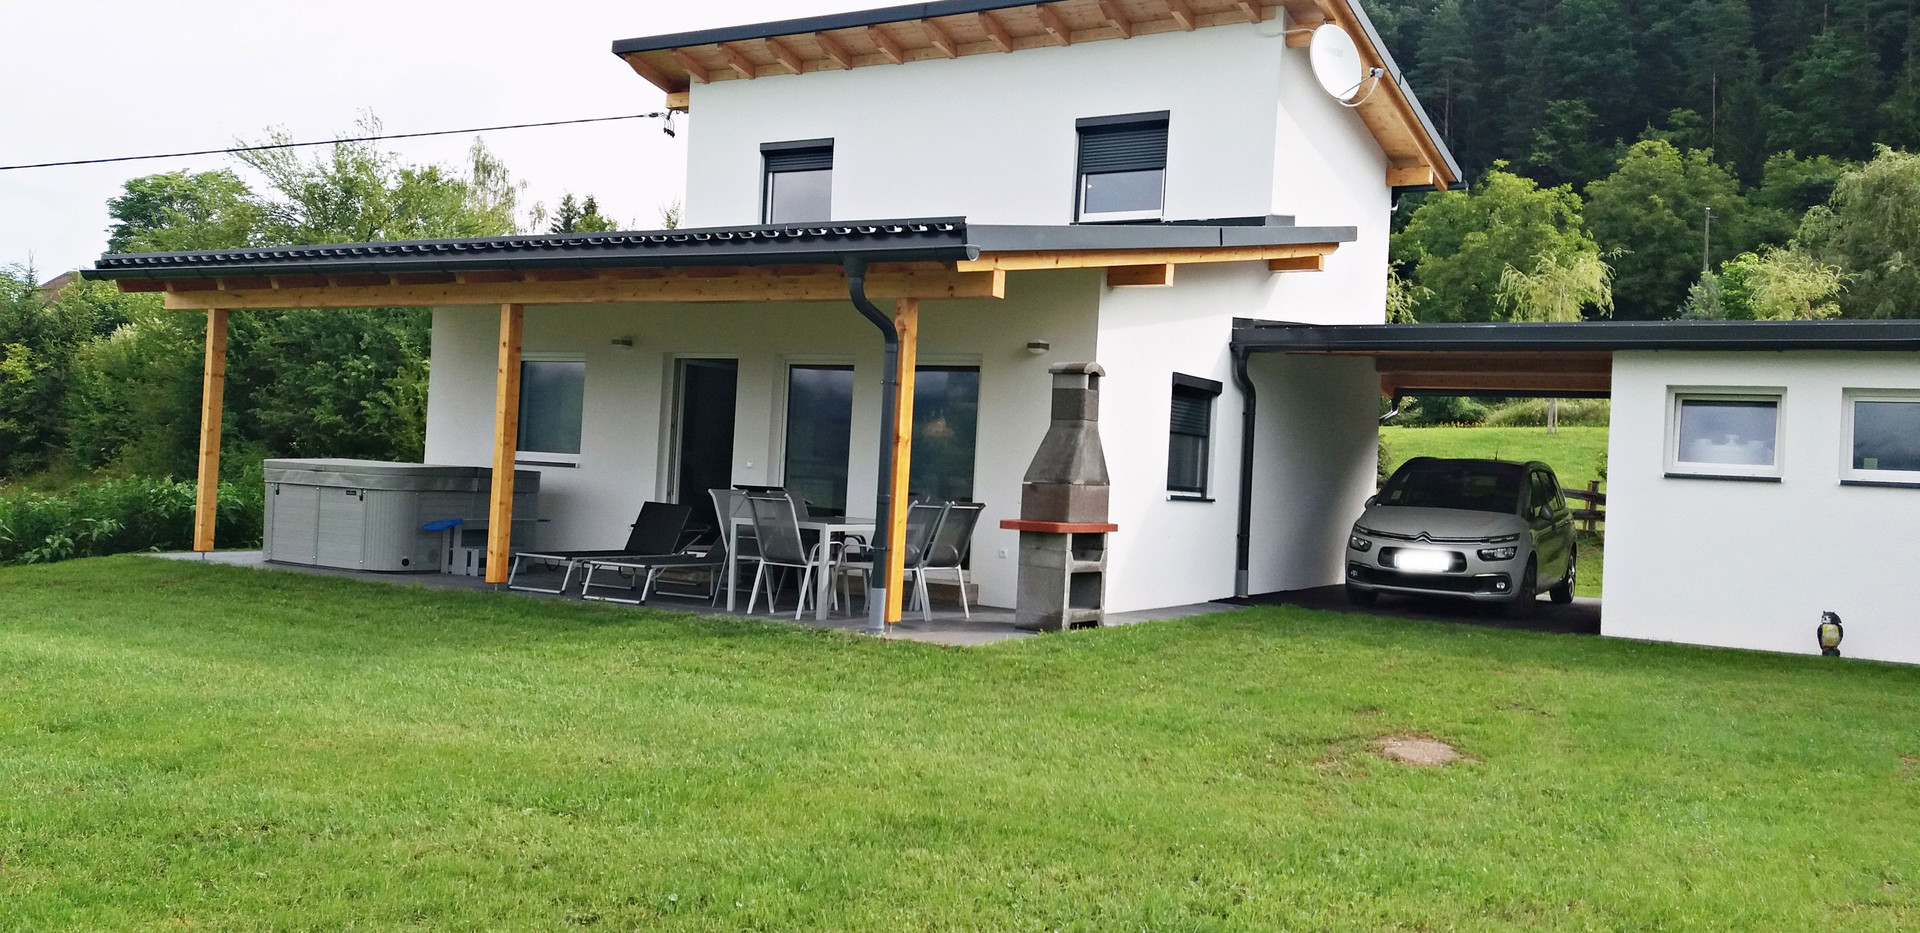 Ferienhaus Turrach